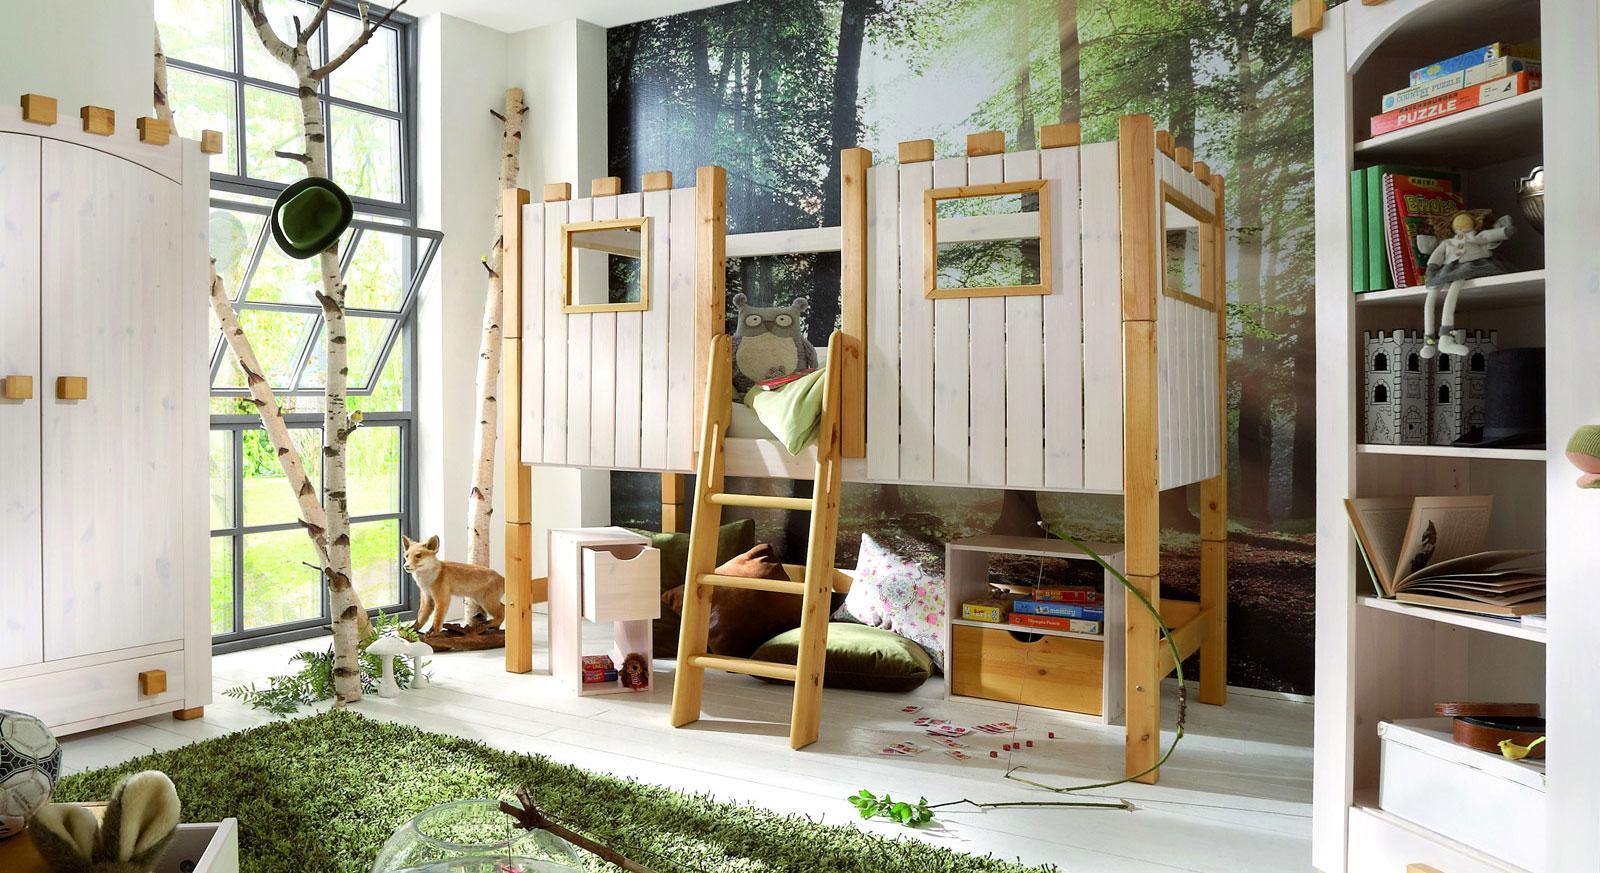 Full Size of Sofa Kinderzimmer Regale Regal Weiß Kinderzimmer Kinderzimmer Hochbett